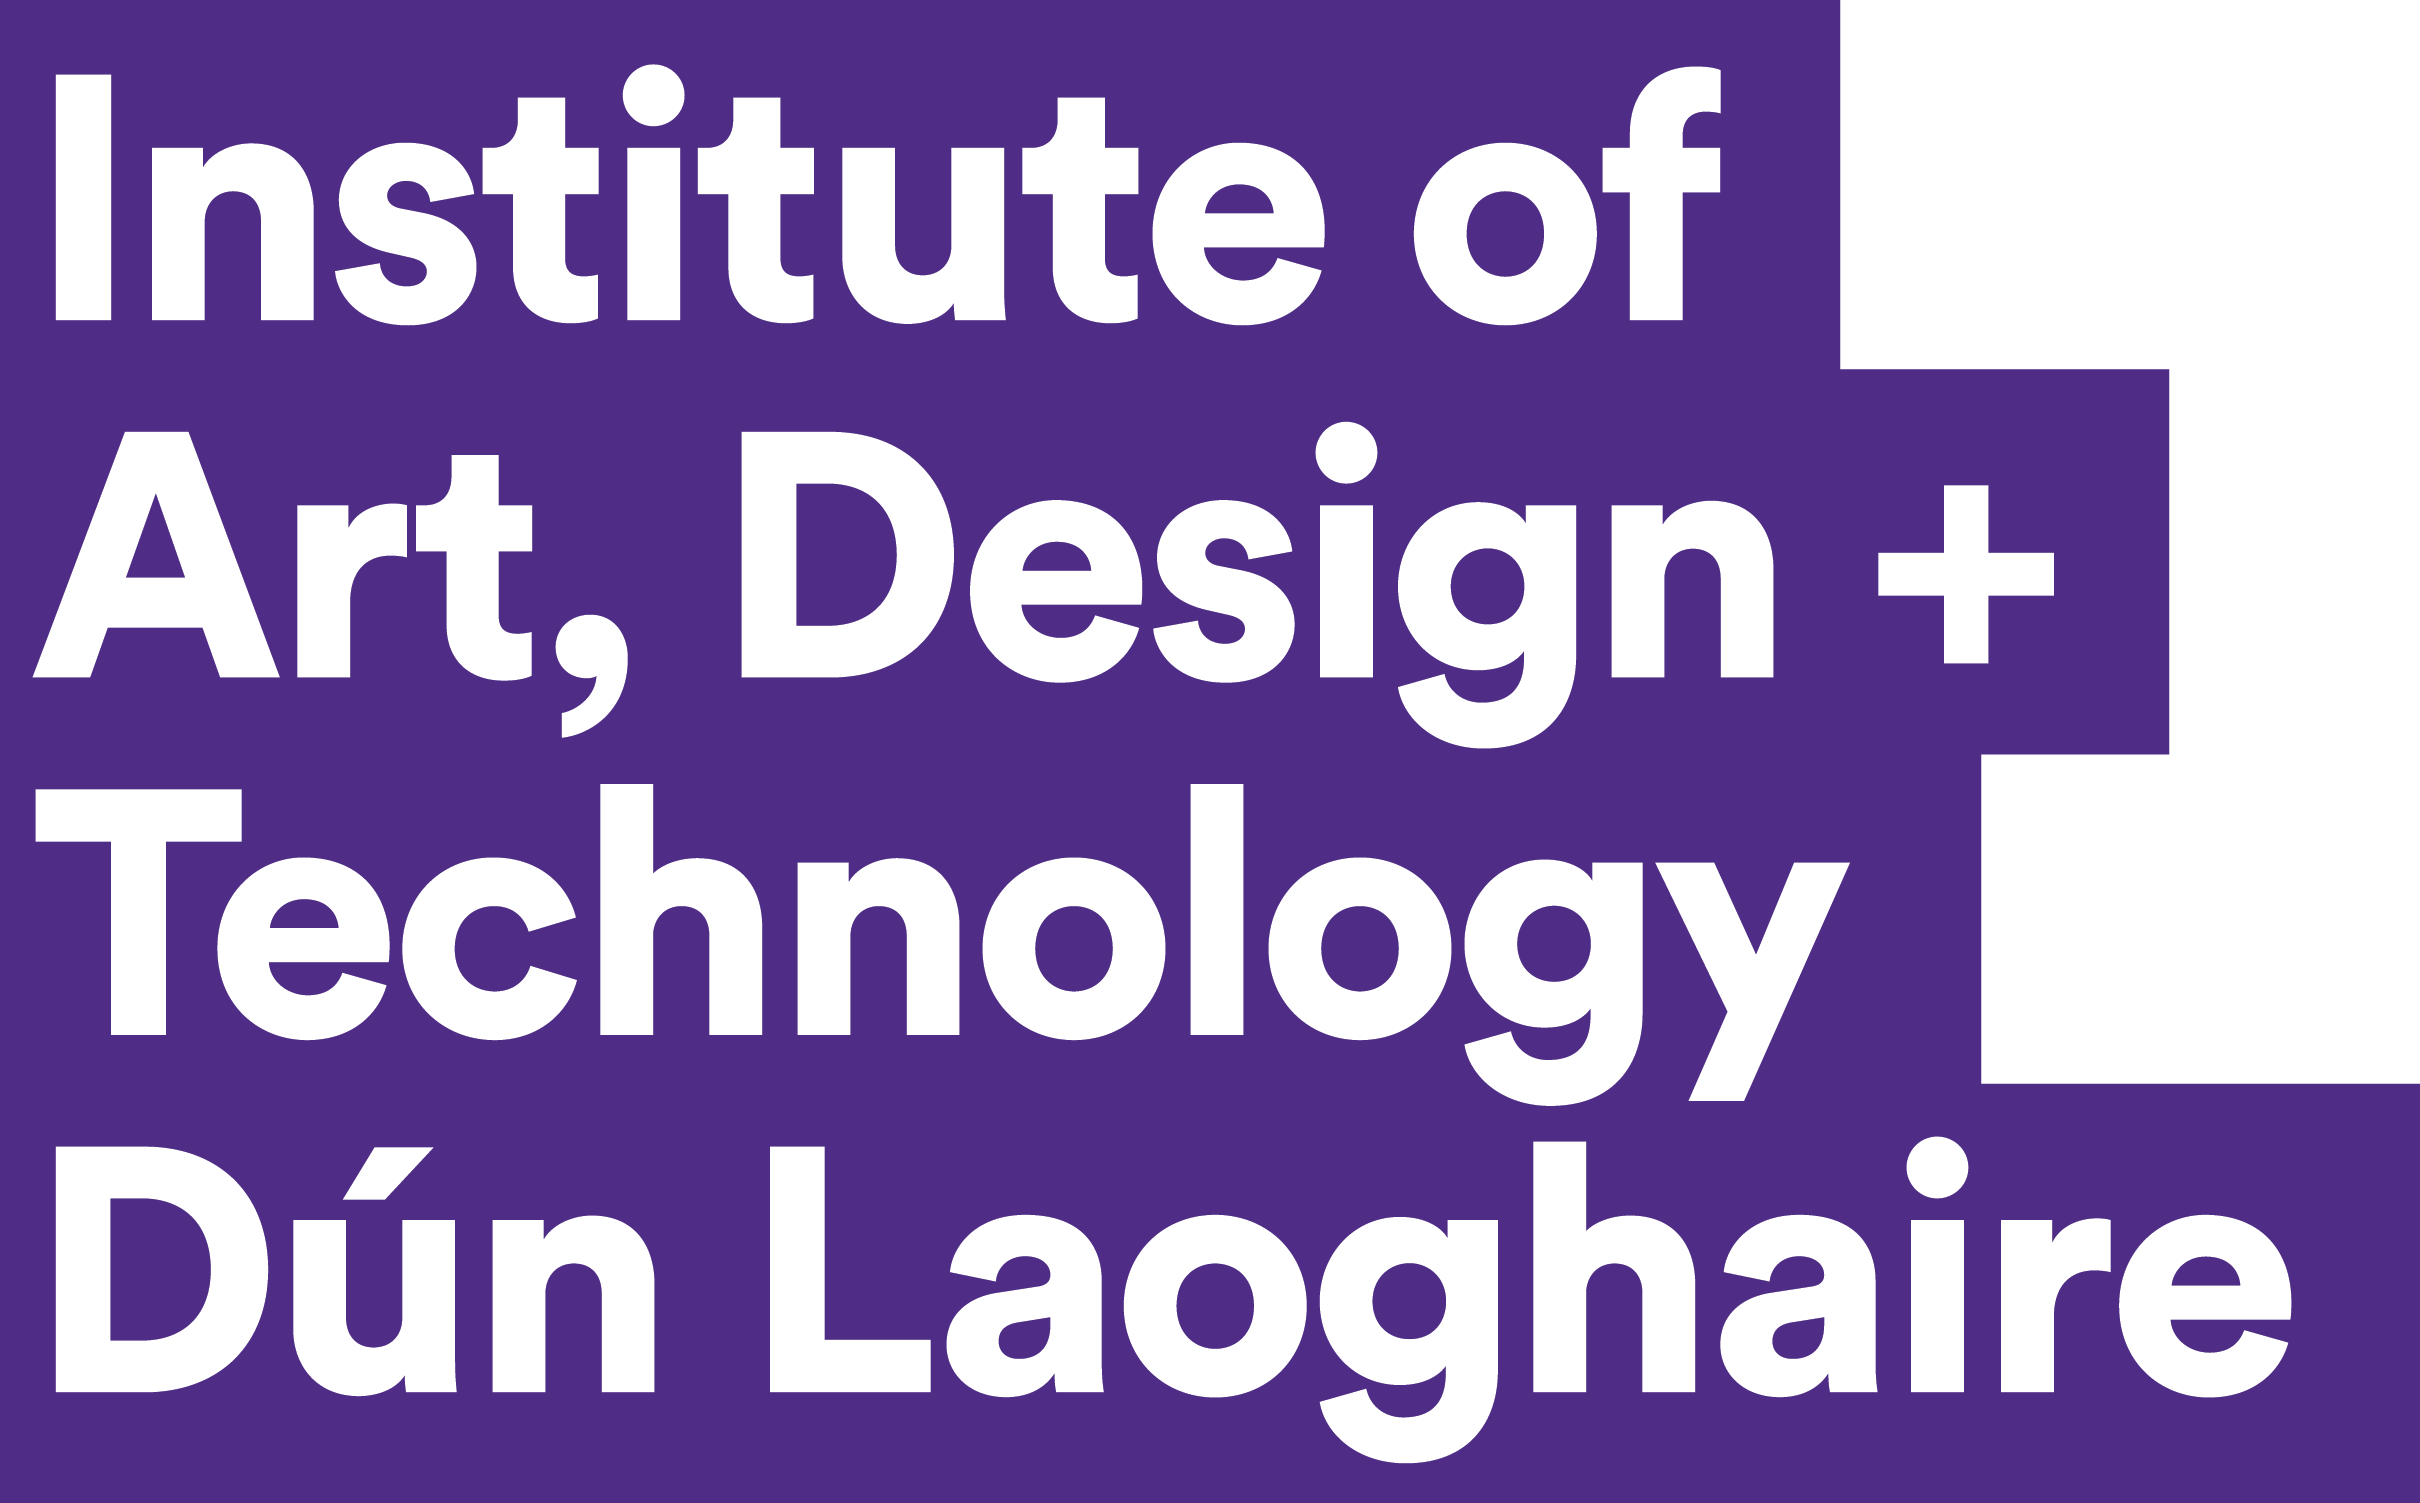 Institute of Art Design & Technology, Dún Laoghaire (IADT)